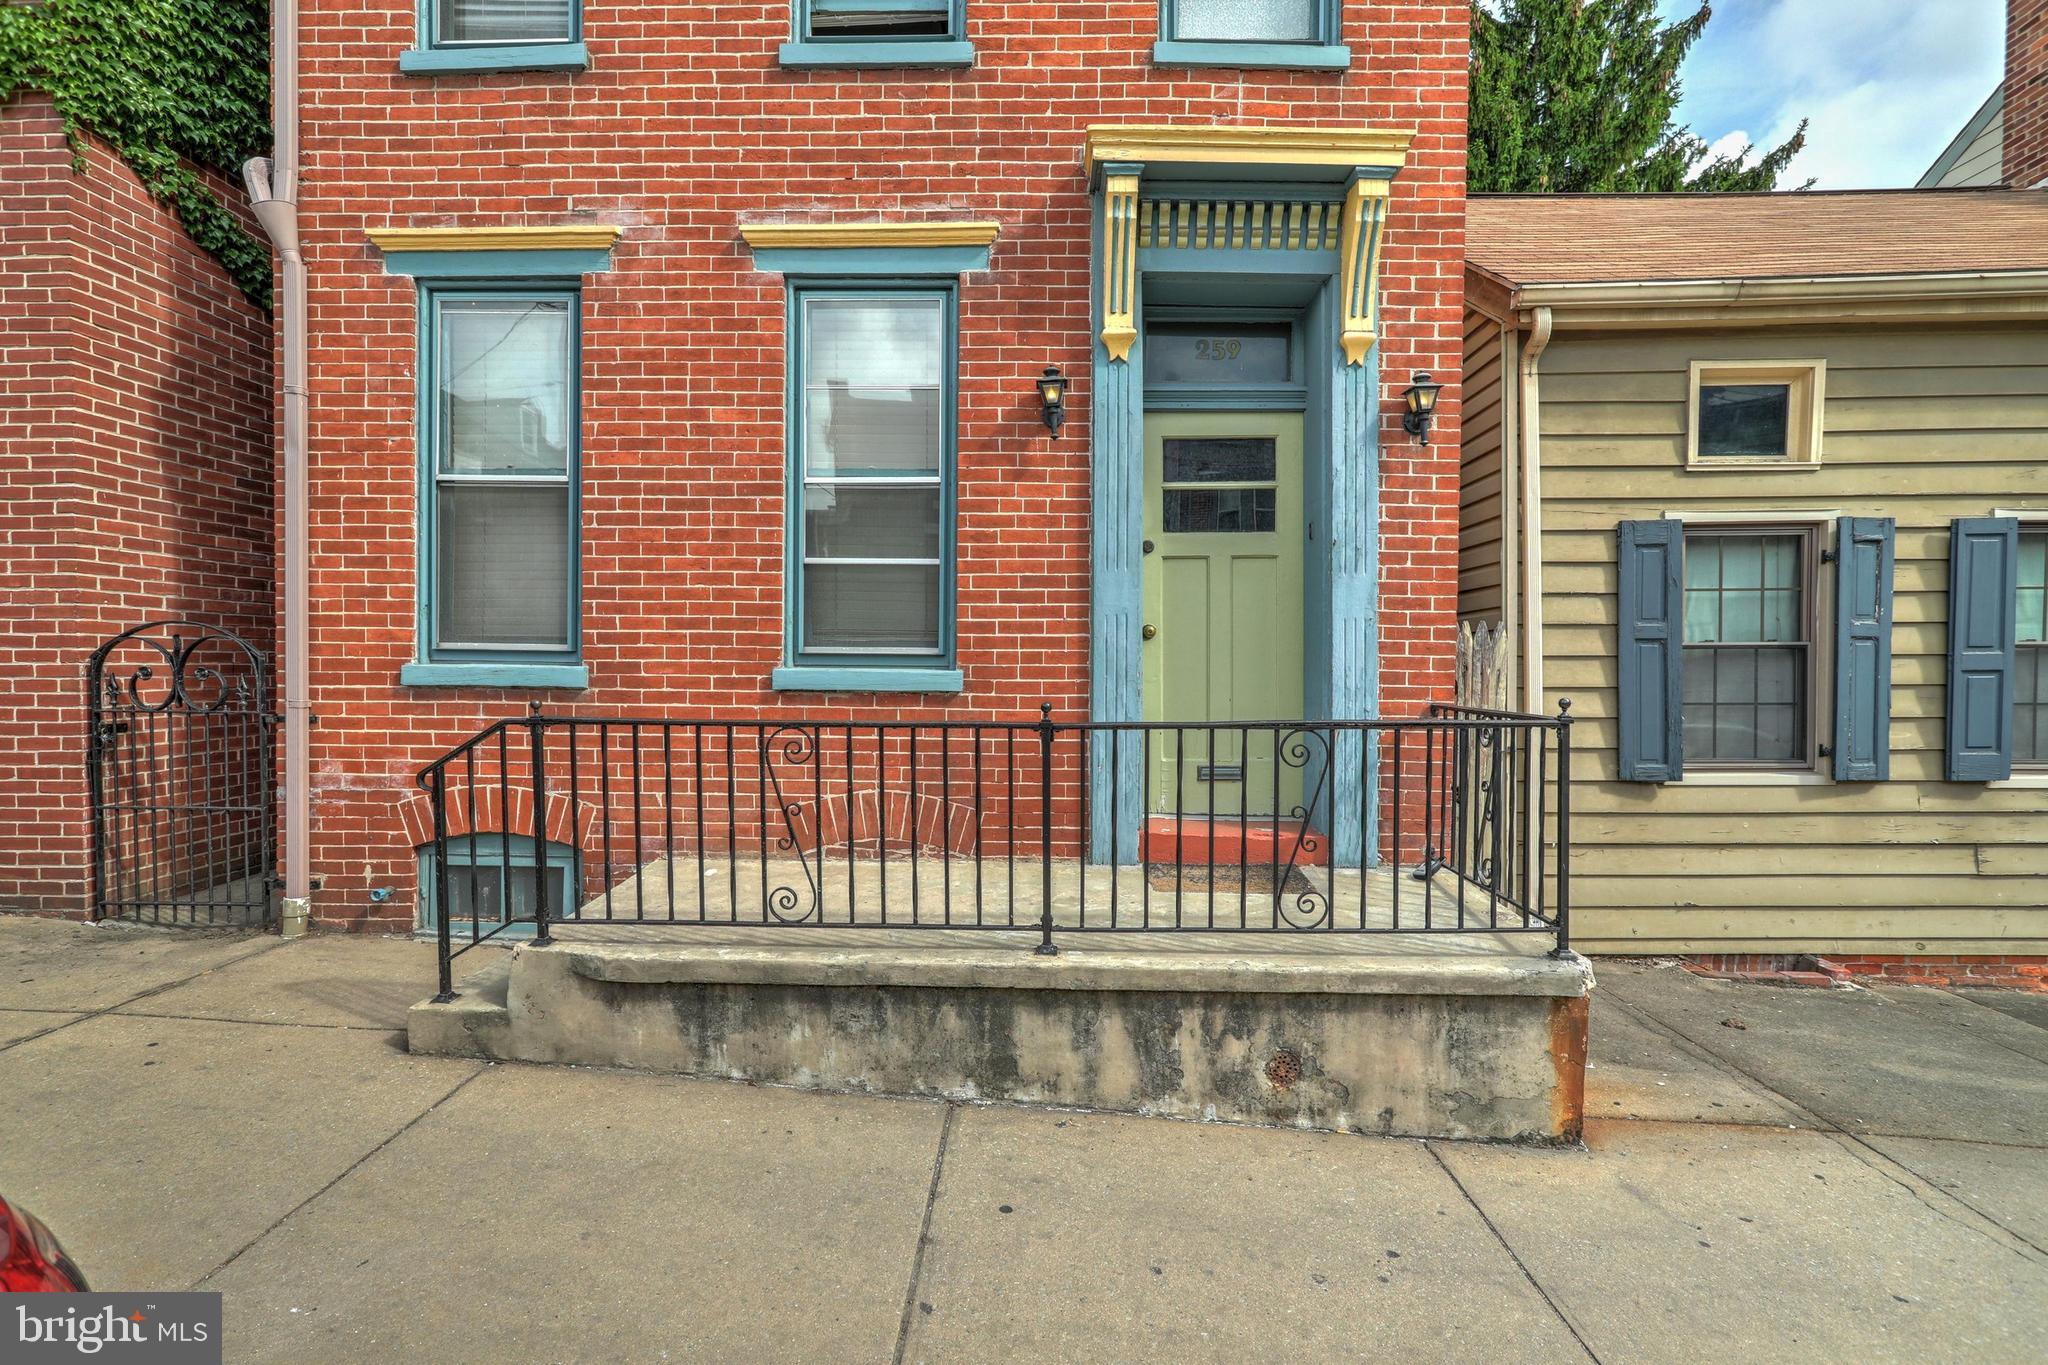 259 W Philadelphia Street, York, PA 17401